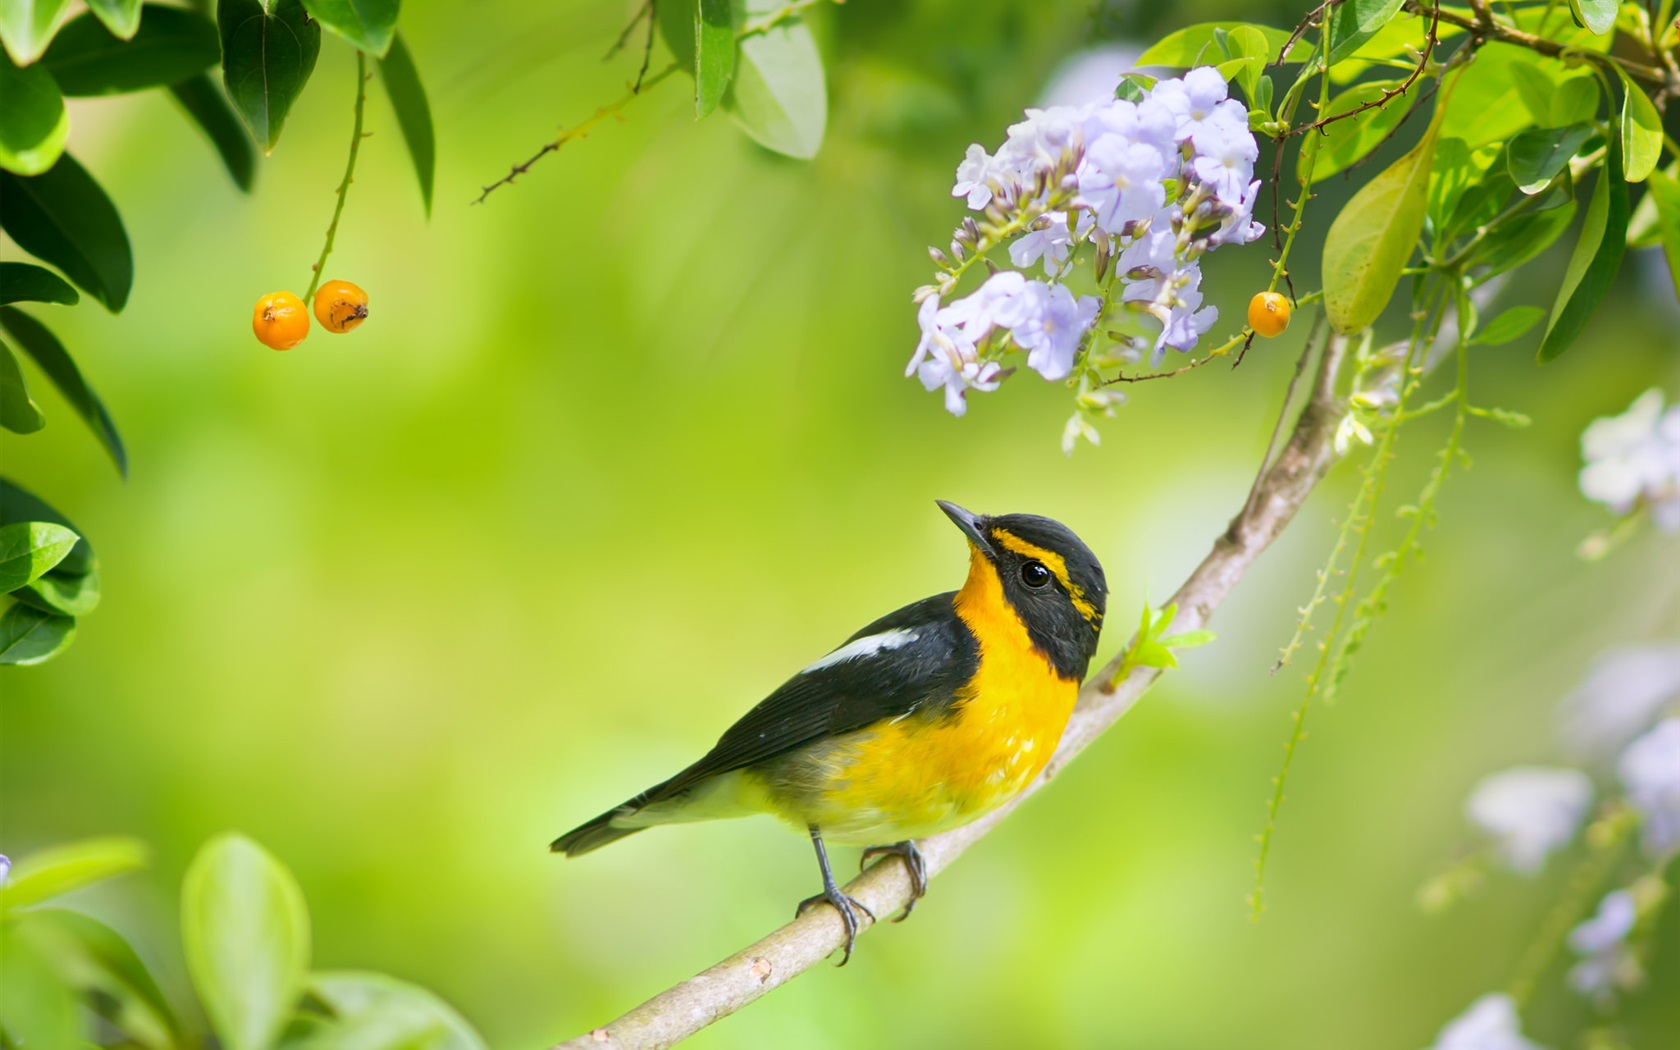 download wallpaper 1680x1050 japanese paradise flycatcher